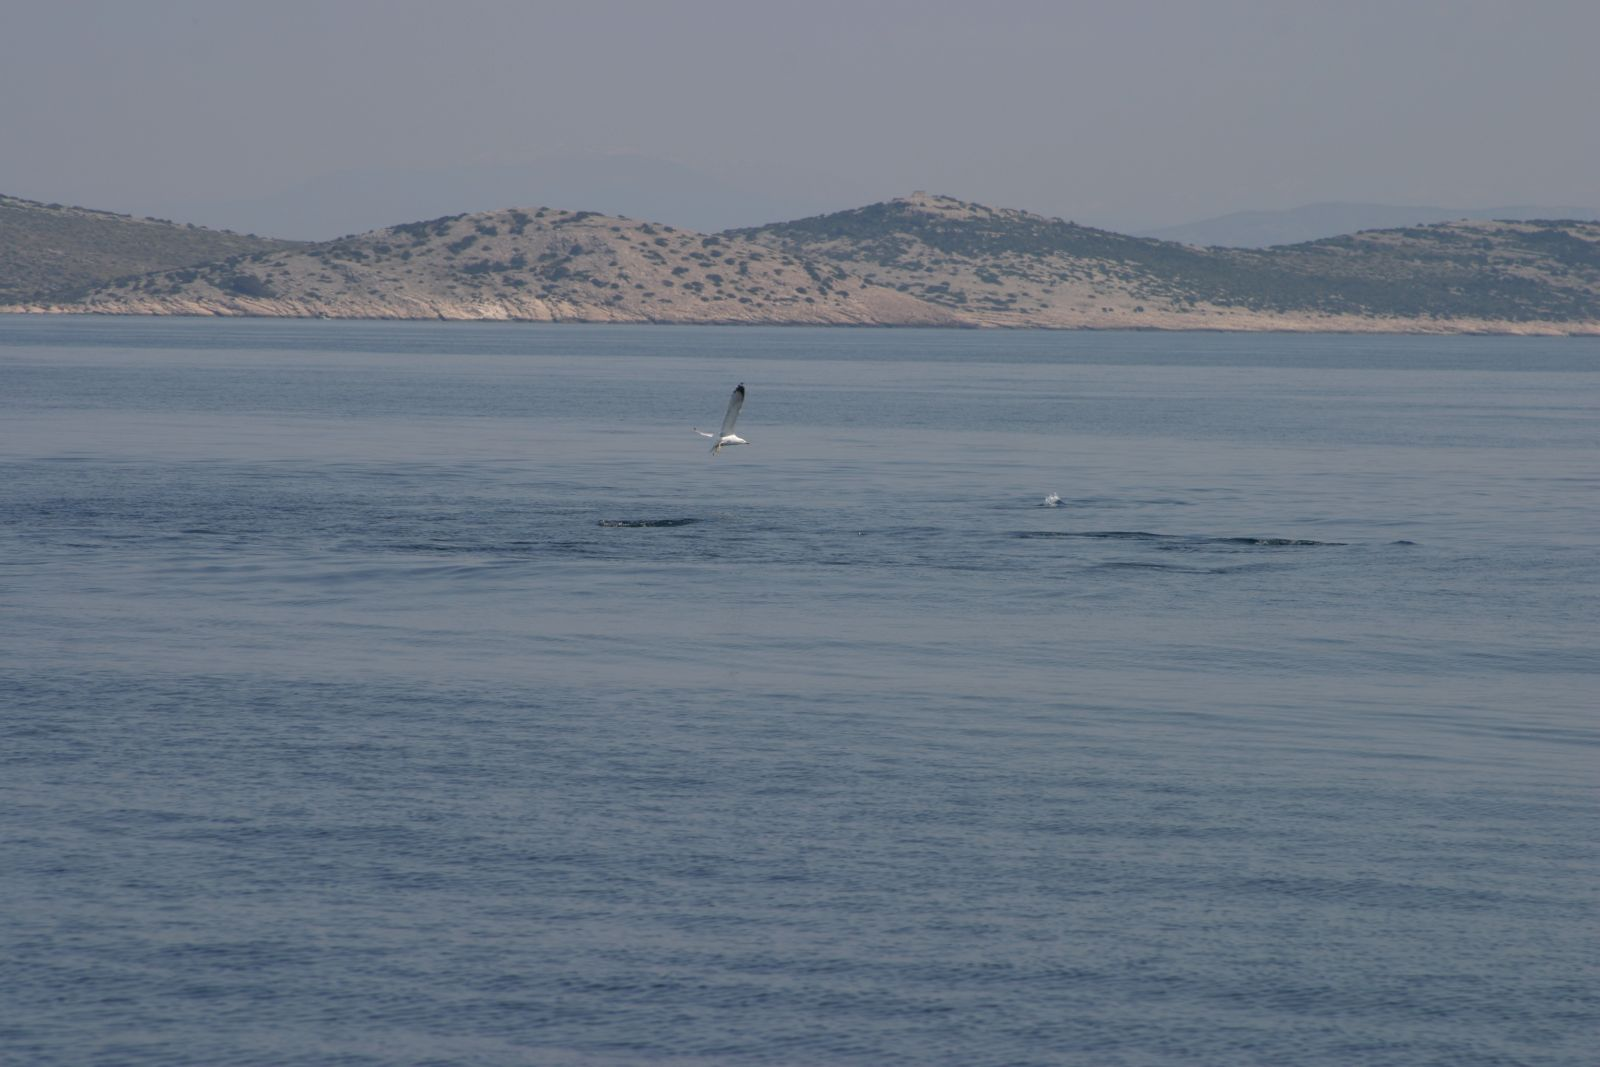 udica oceana izvora